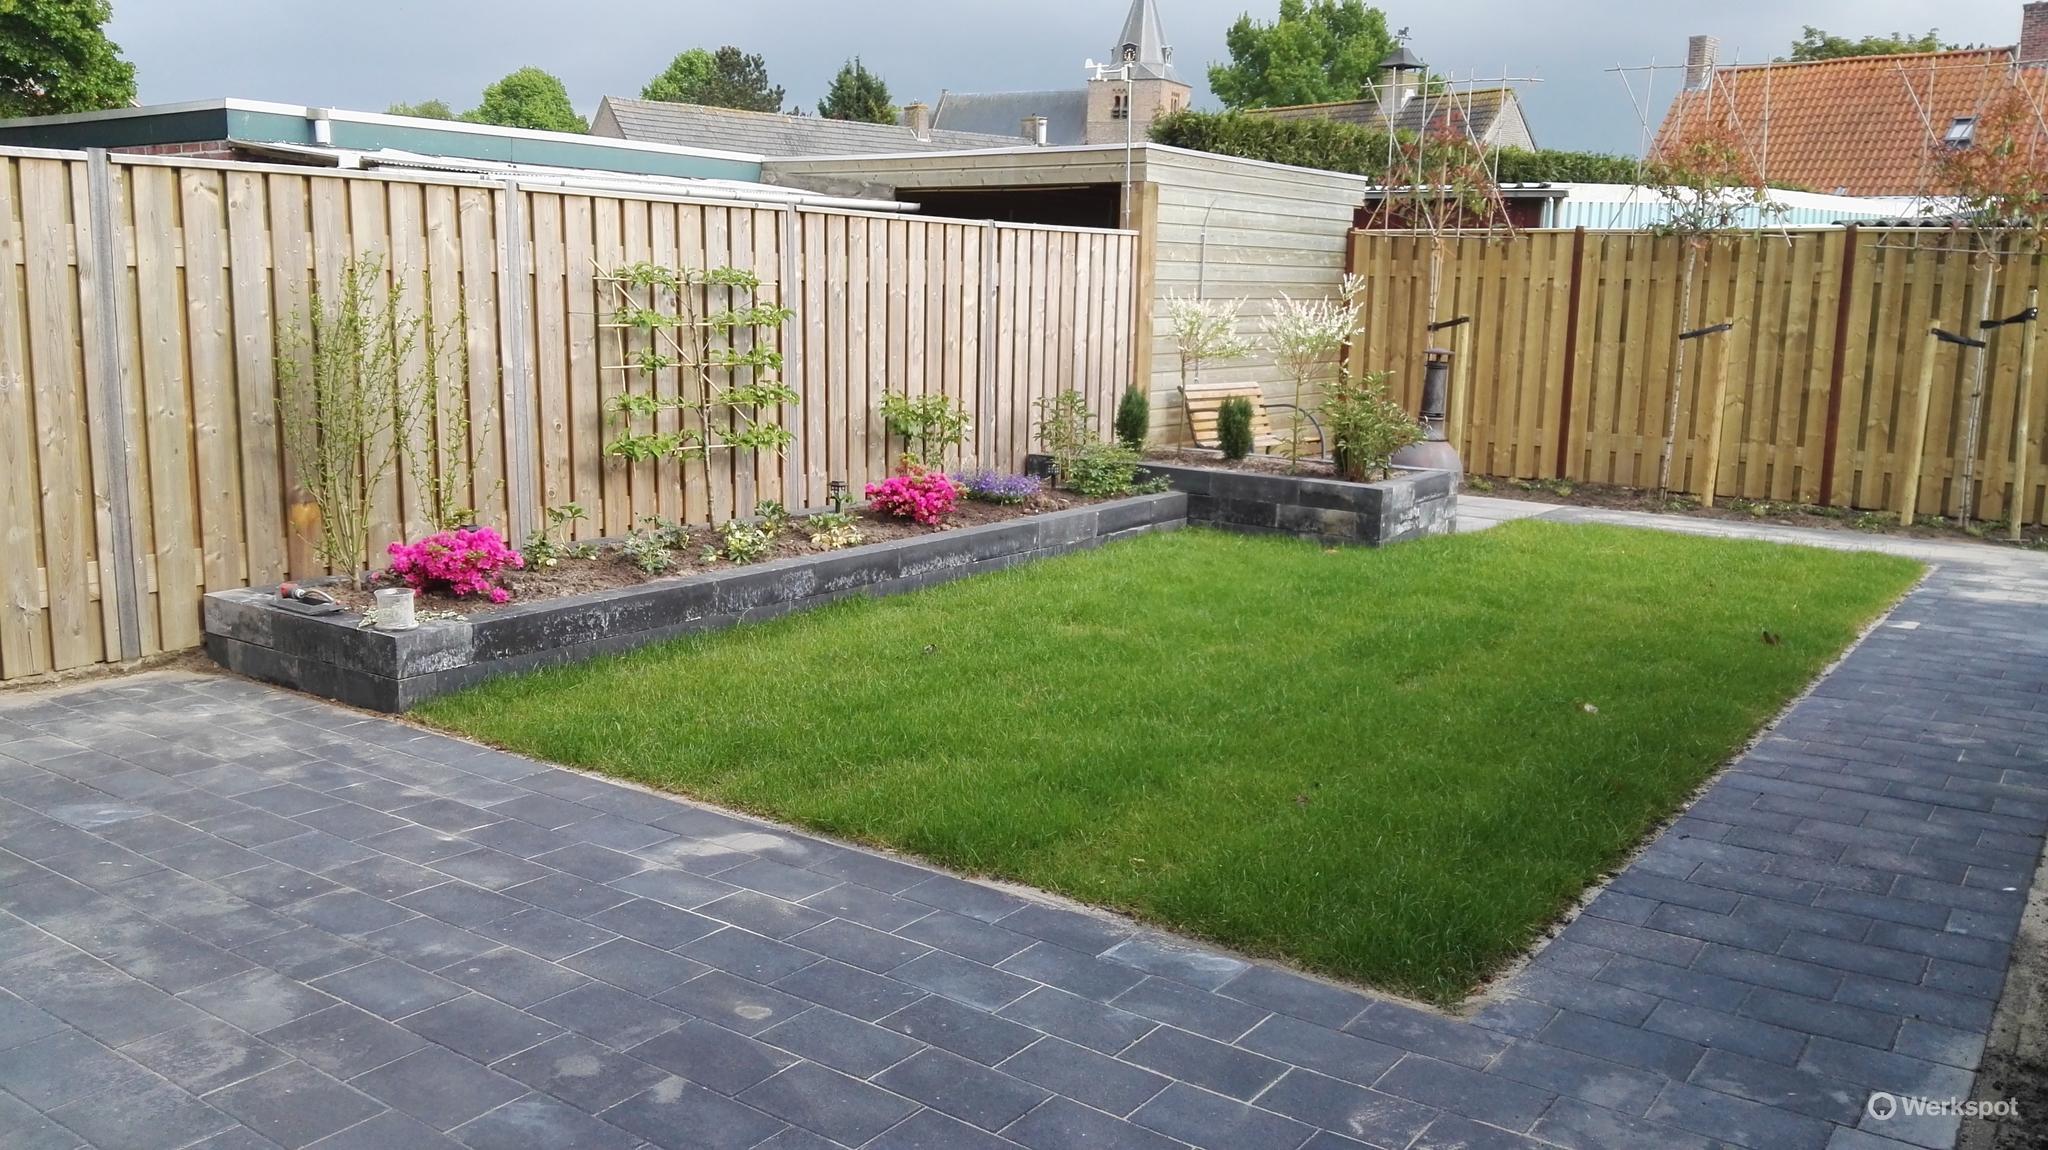 Tuin Laten Bestraten : Aanleg tuin evt drainage en her bestraten werkspot